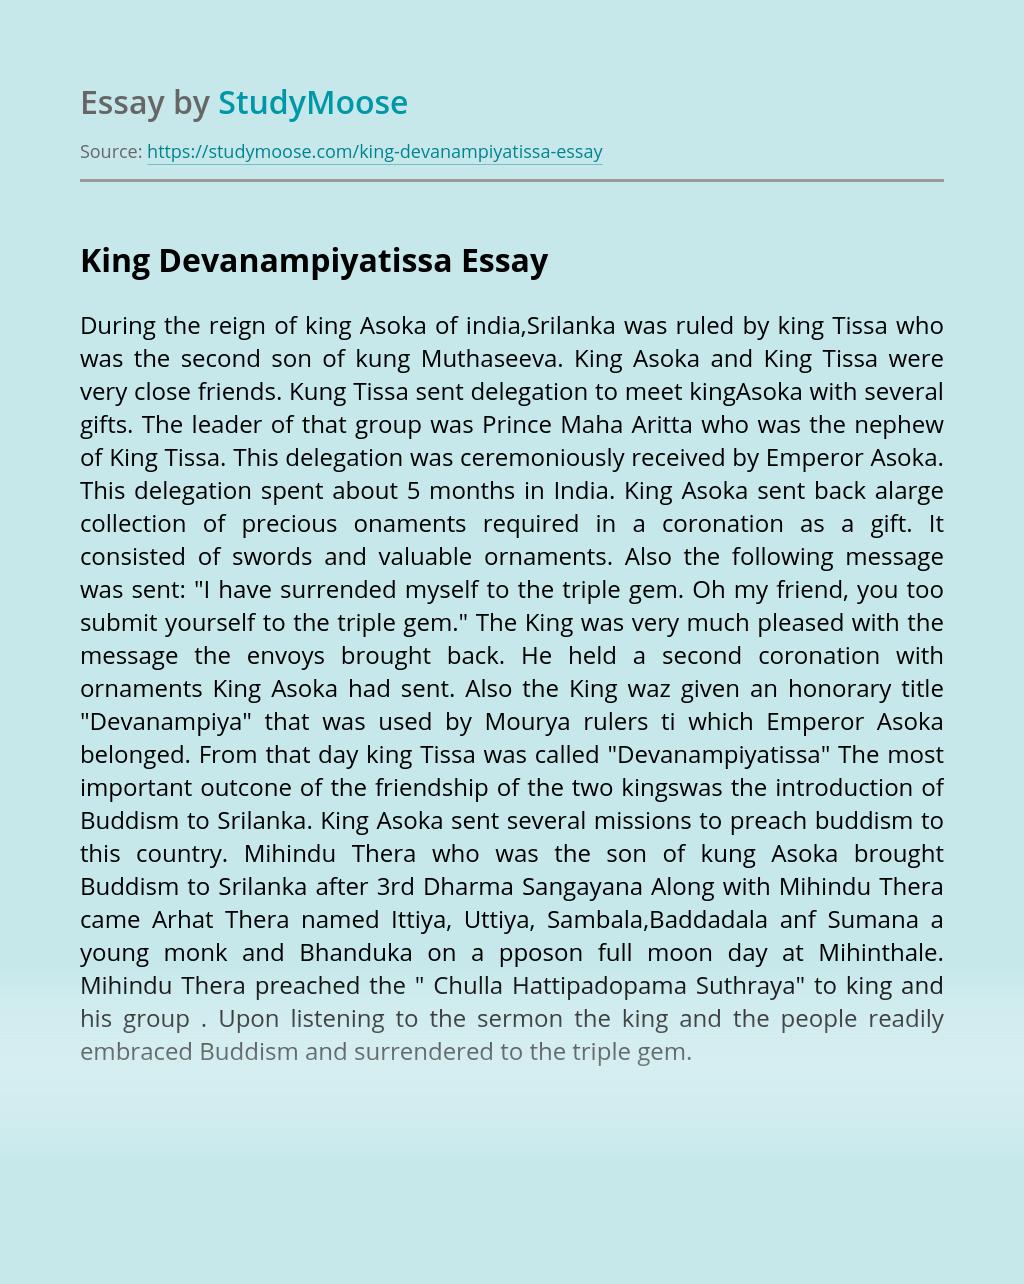 King Devanampiyatissa